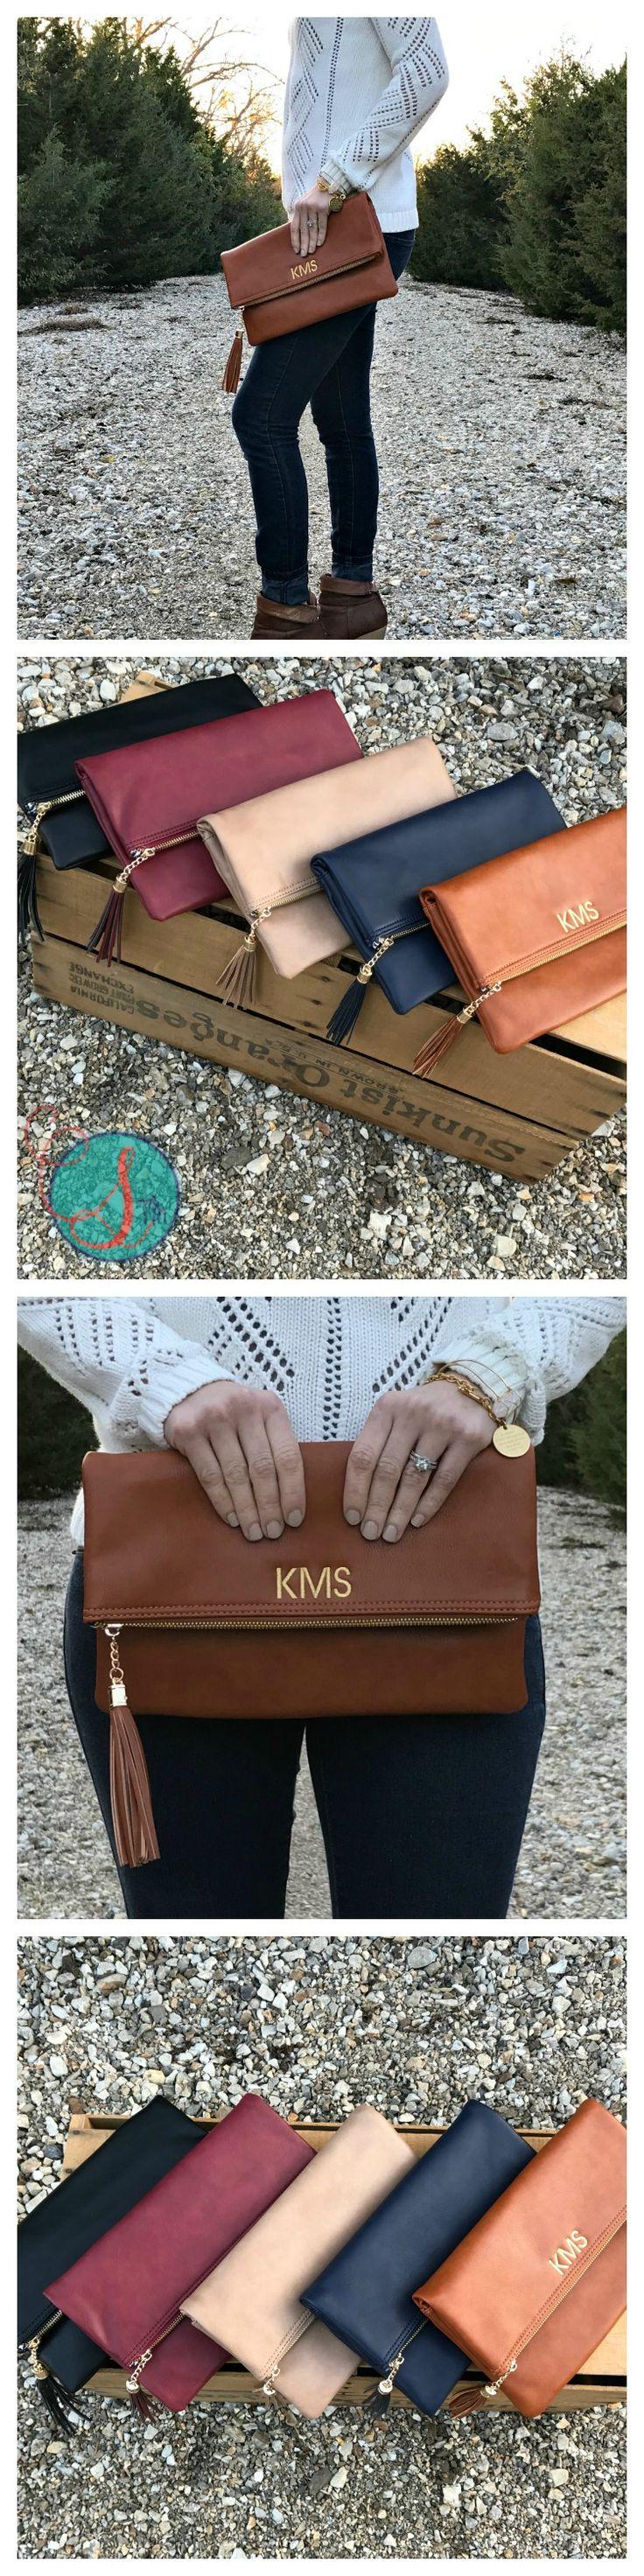 Monogram Purse | Monogram Clutch | Monogram Tassel Clutch | Christmas Gifts for Her | Monogram Christmas Gifts | Gifts for Her | Christmas Gifts for Mom | Gifts for Friends | Monogram Fashion